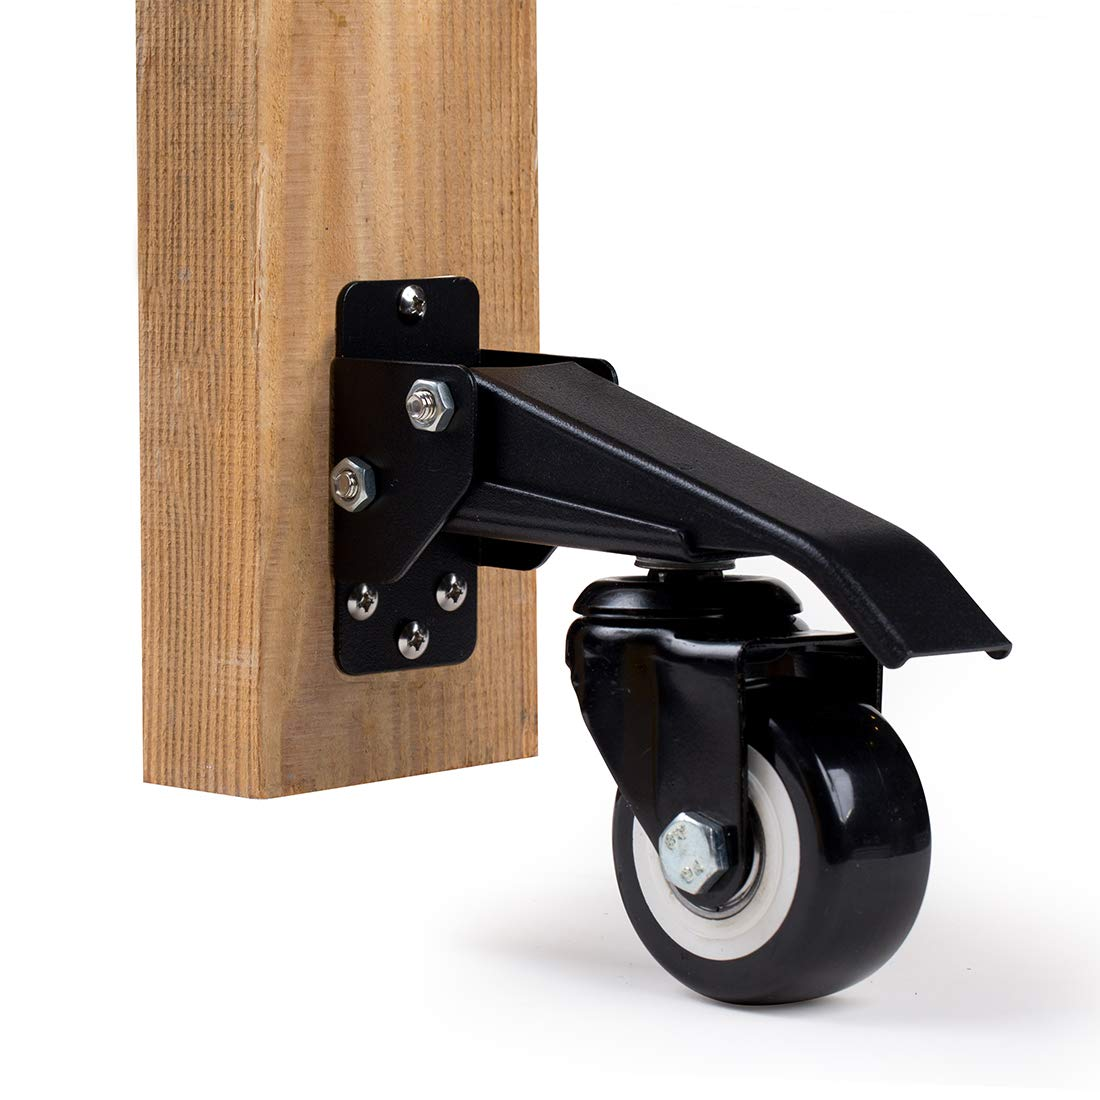 EASYTECH Workbech Stepdown Caster Kit, Set of 4